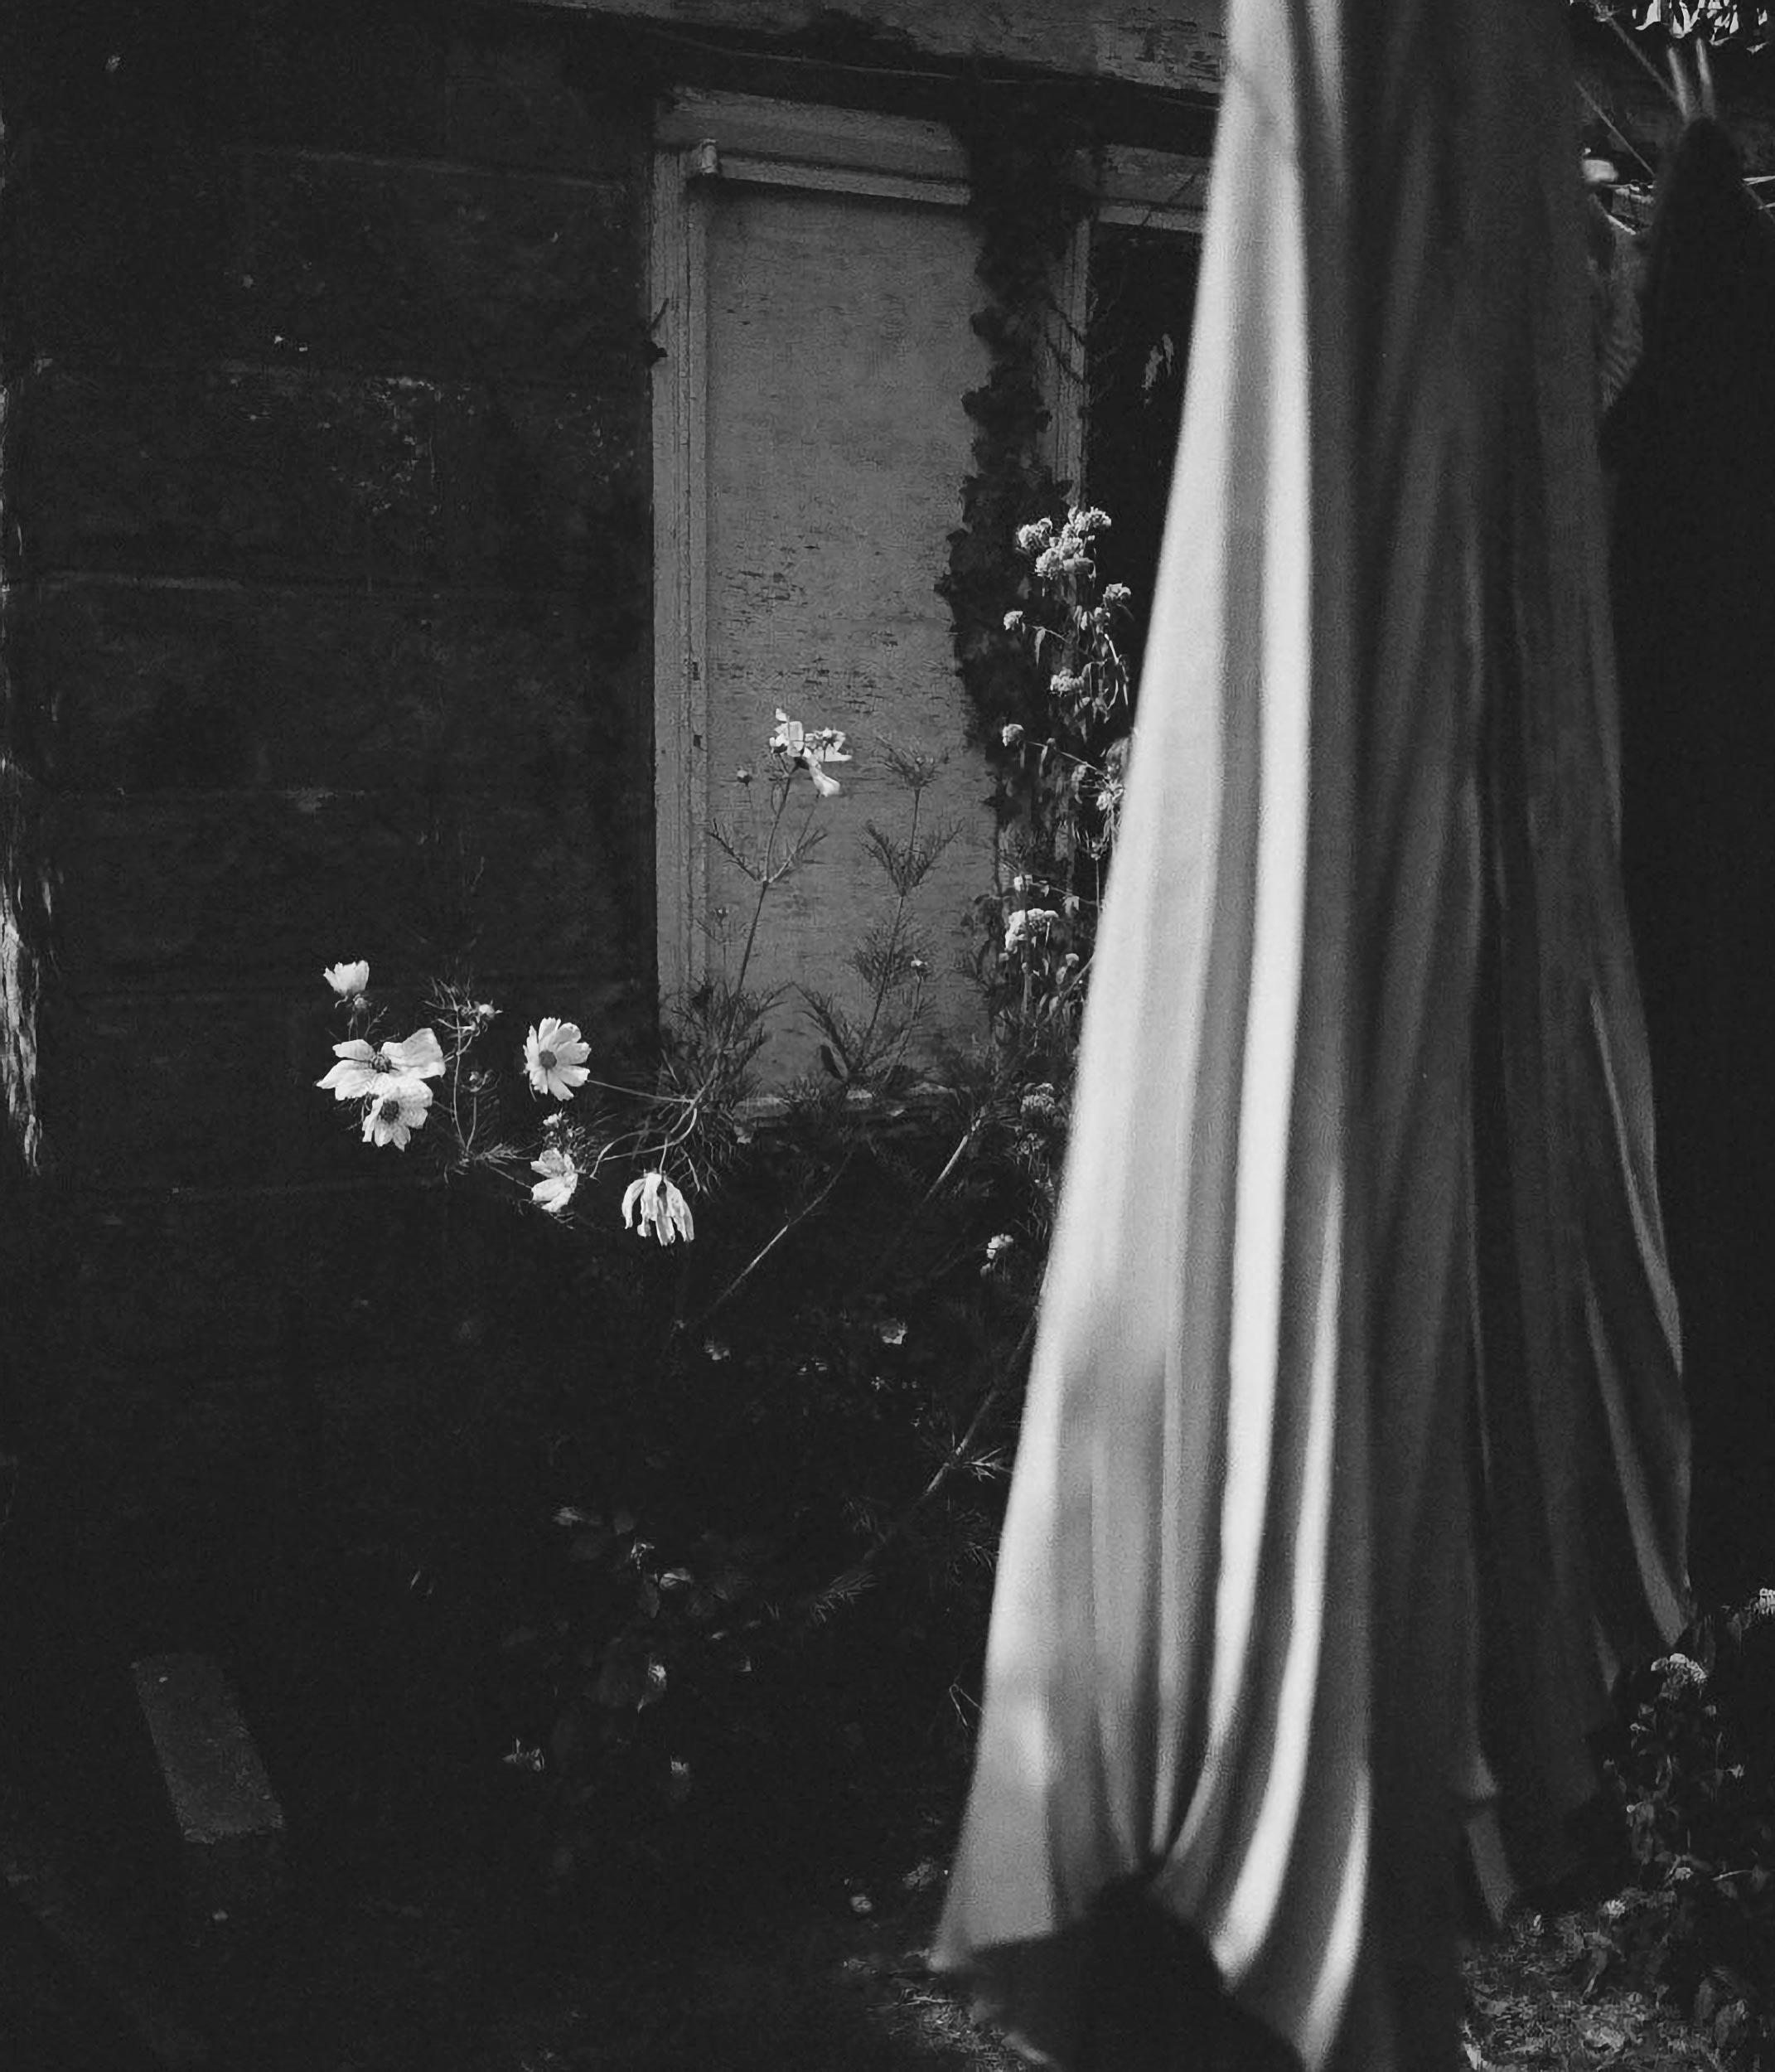 Jessica MacCormick: Lifestyle shoot for Curionoir